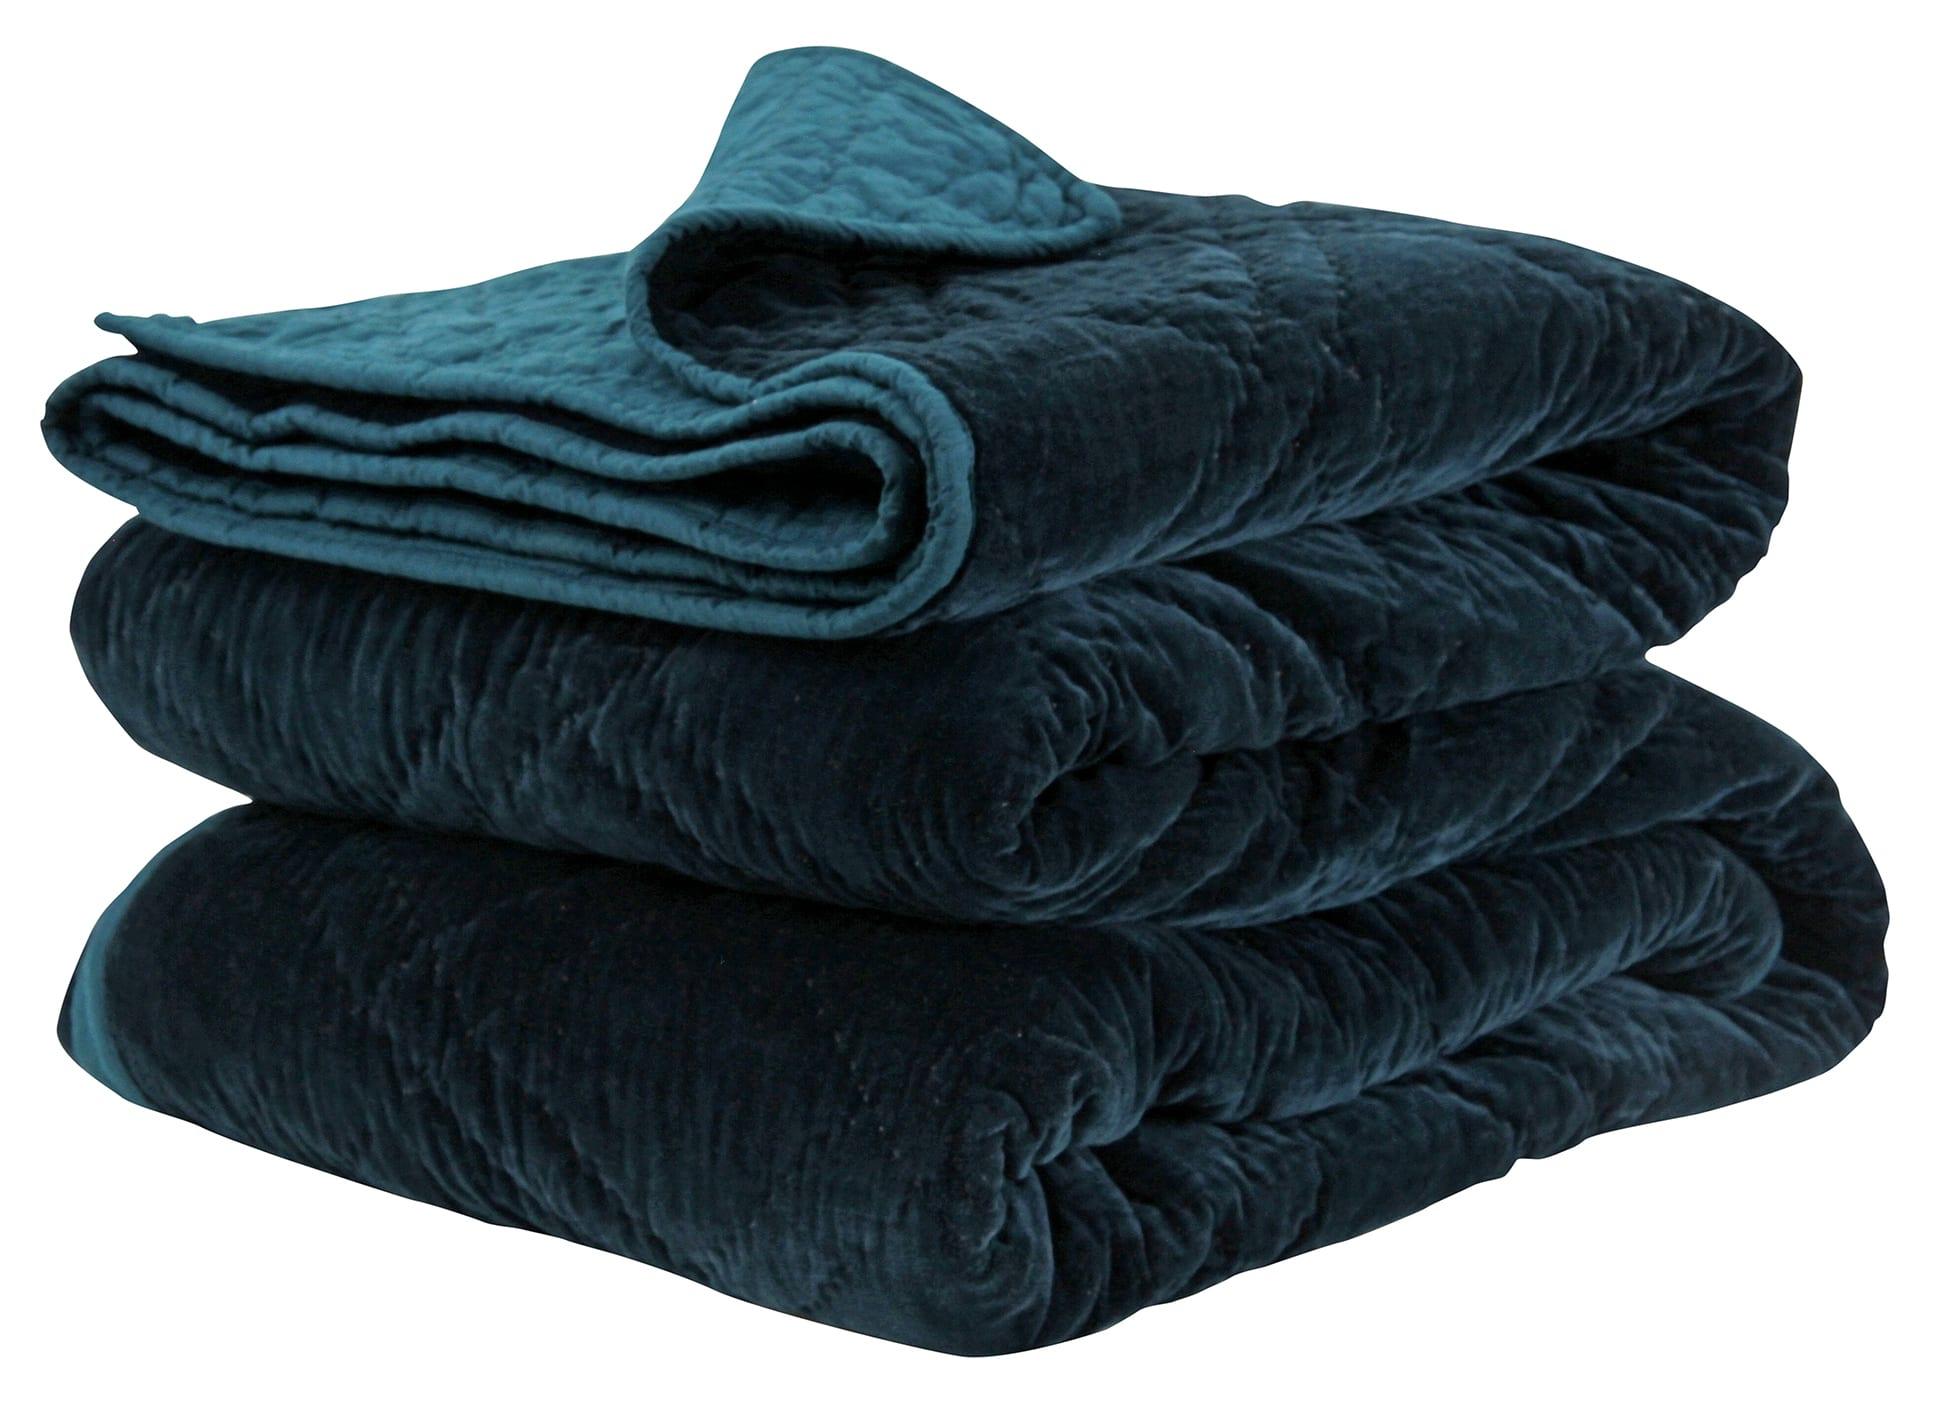 Wallace Cotton Extra Large Peacock Plush Velvet Bedspread